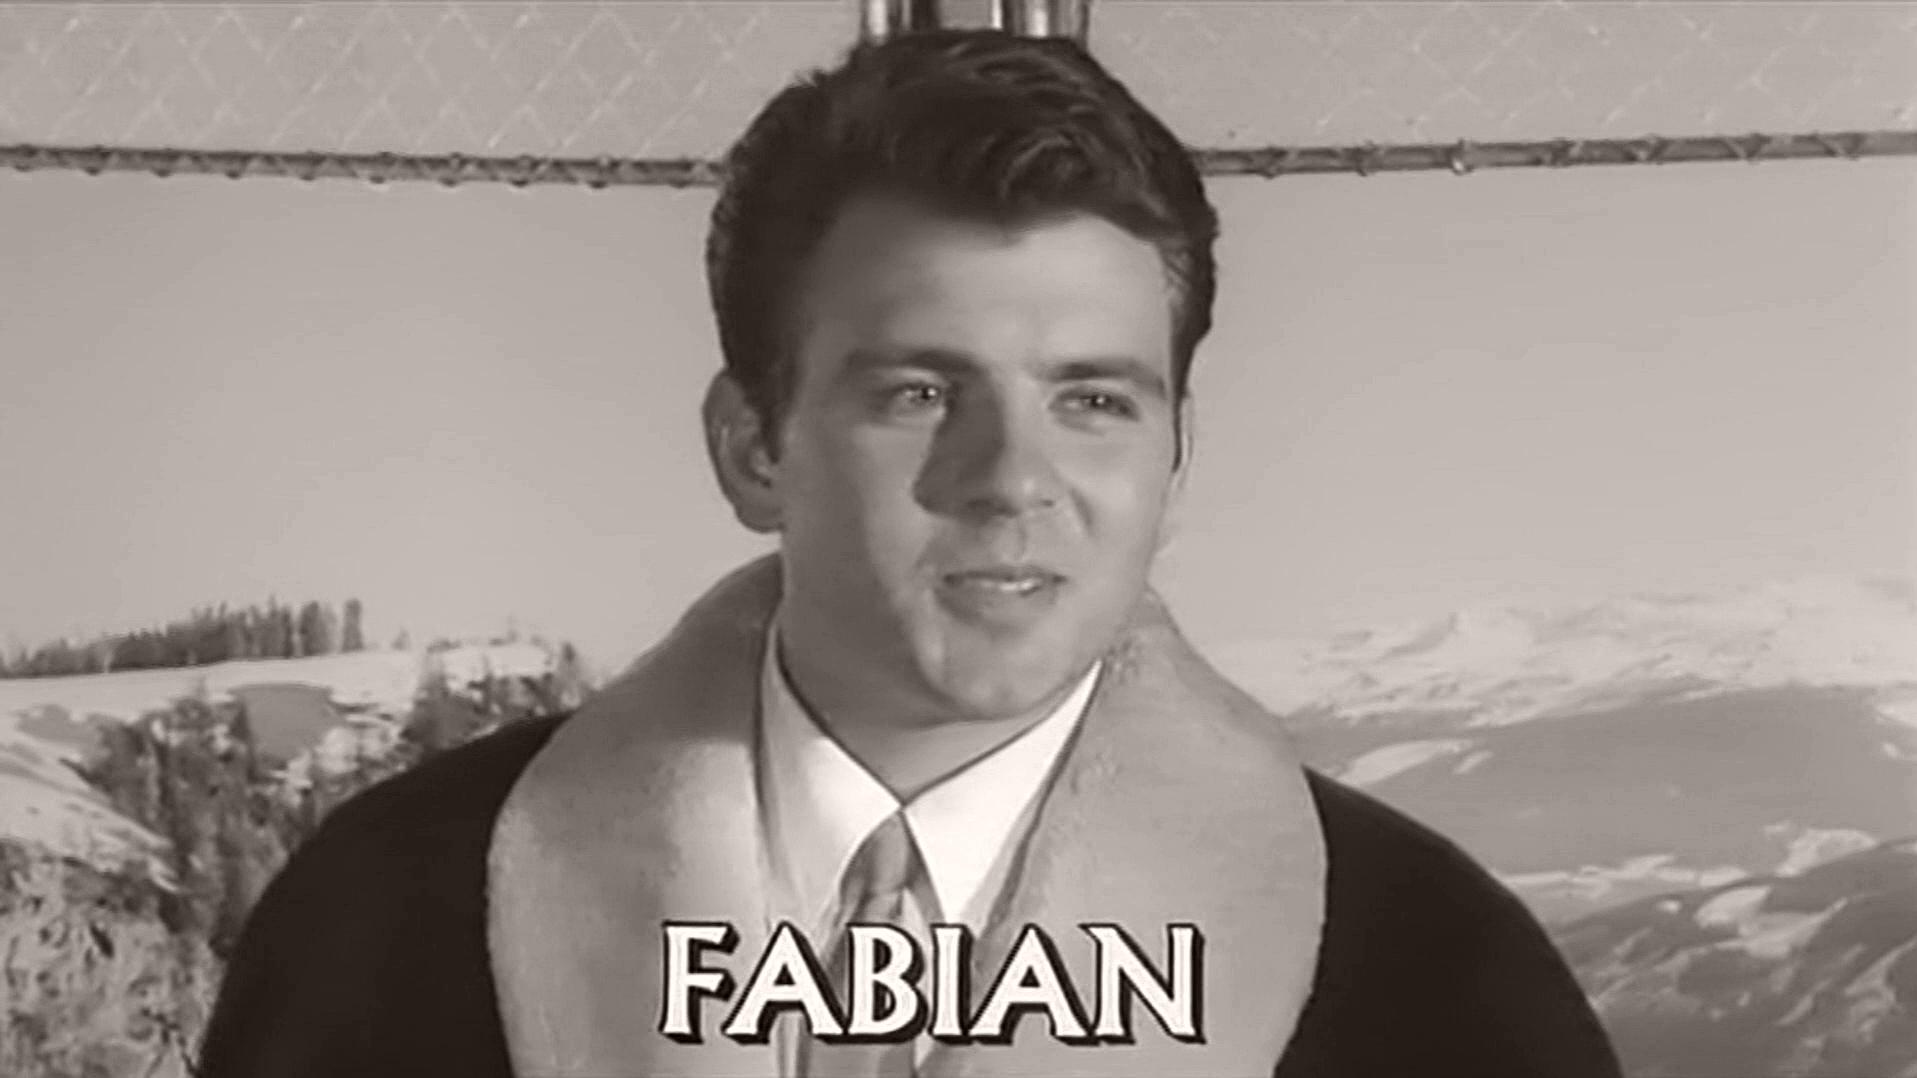 Main title from Ten Little Indians (1965) (10) featuring Fabian